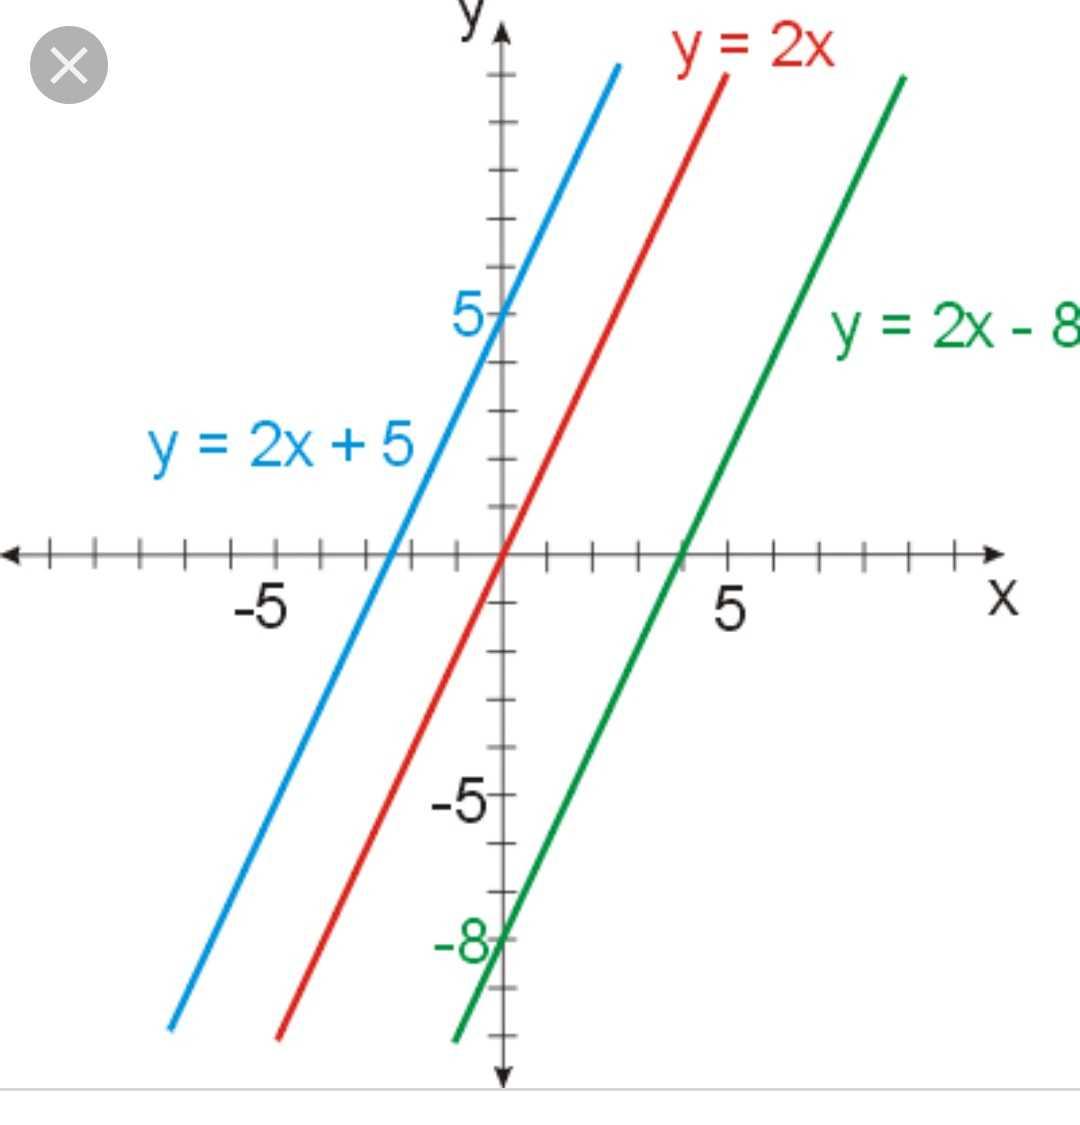 http://forum.matematika.cz/upload3/img/2019-03/85875_IMG_20190314_185104.jpg